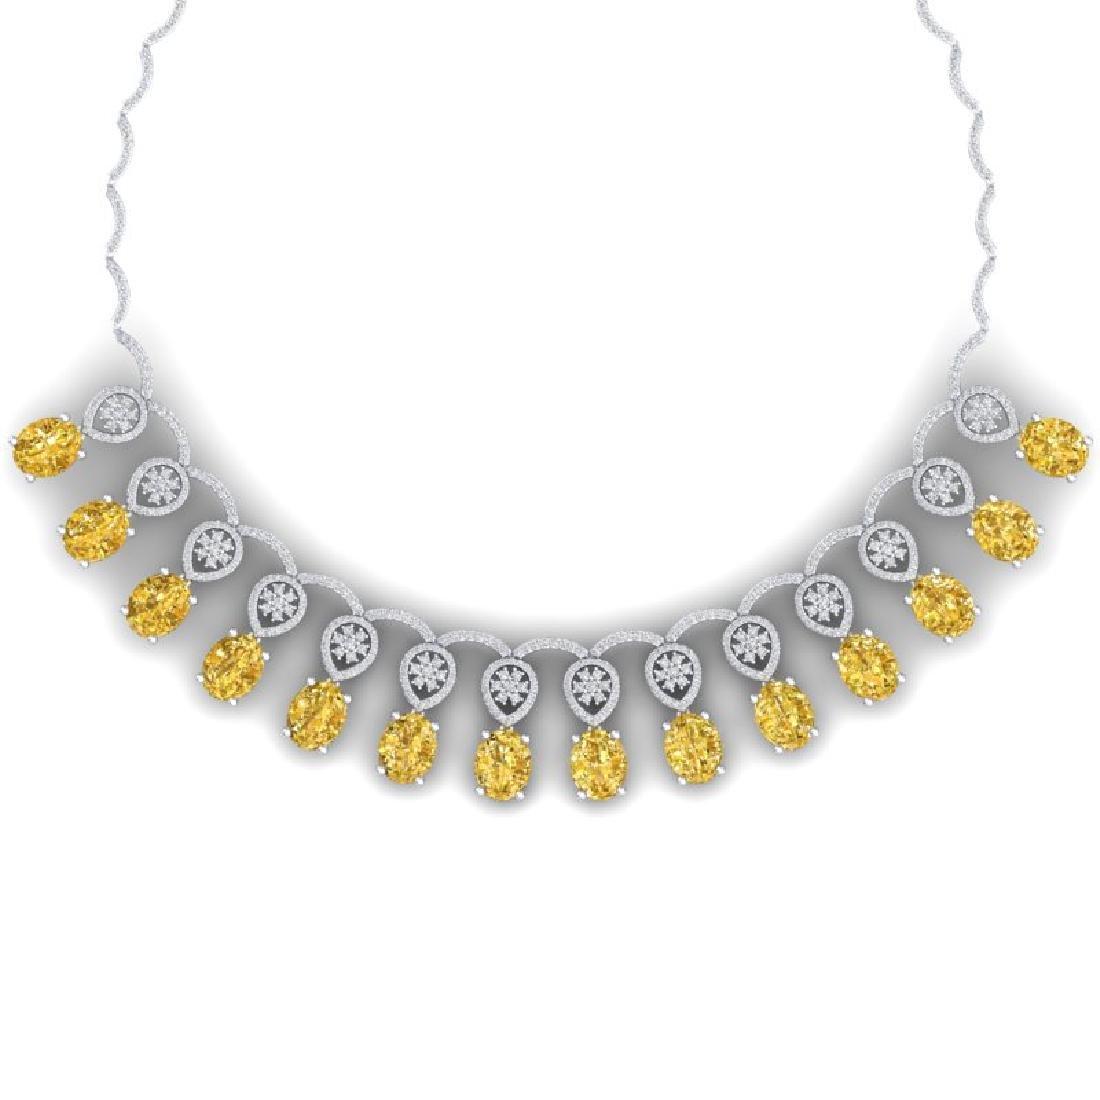 51.57 CTW Royalty Canary Citrine & VS Diamond Necklace